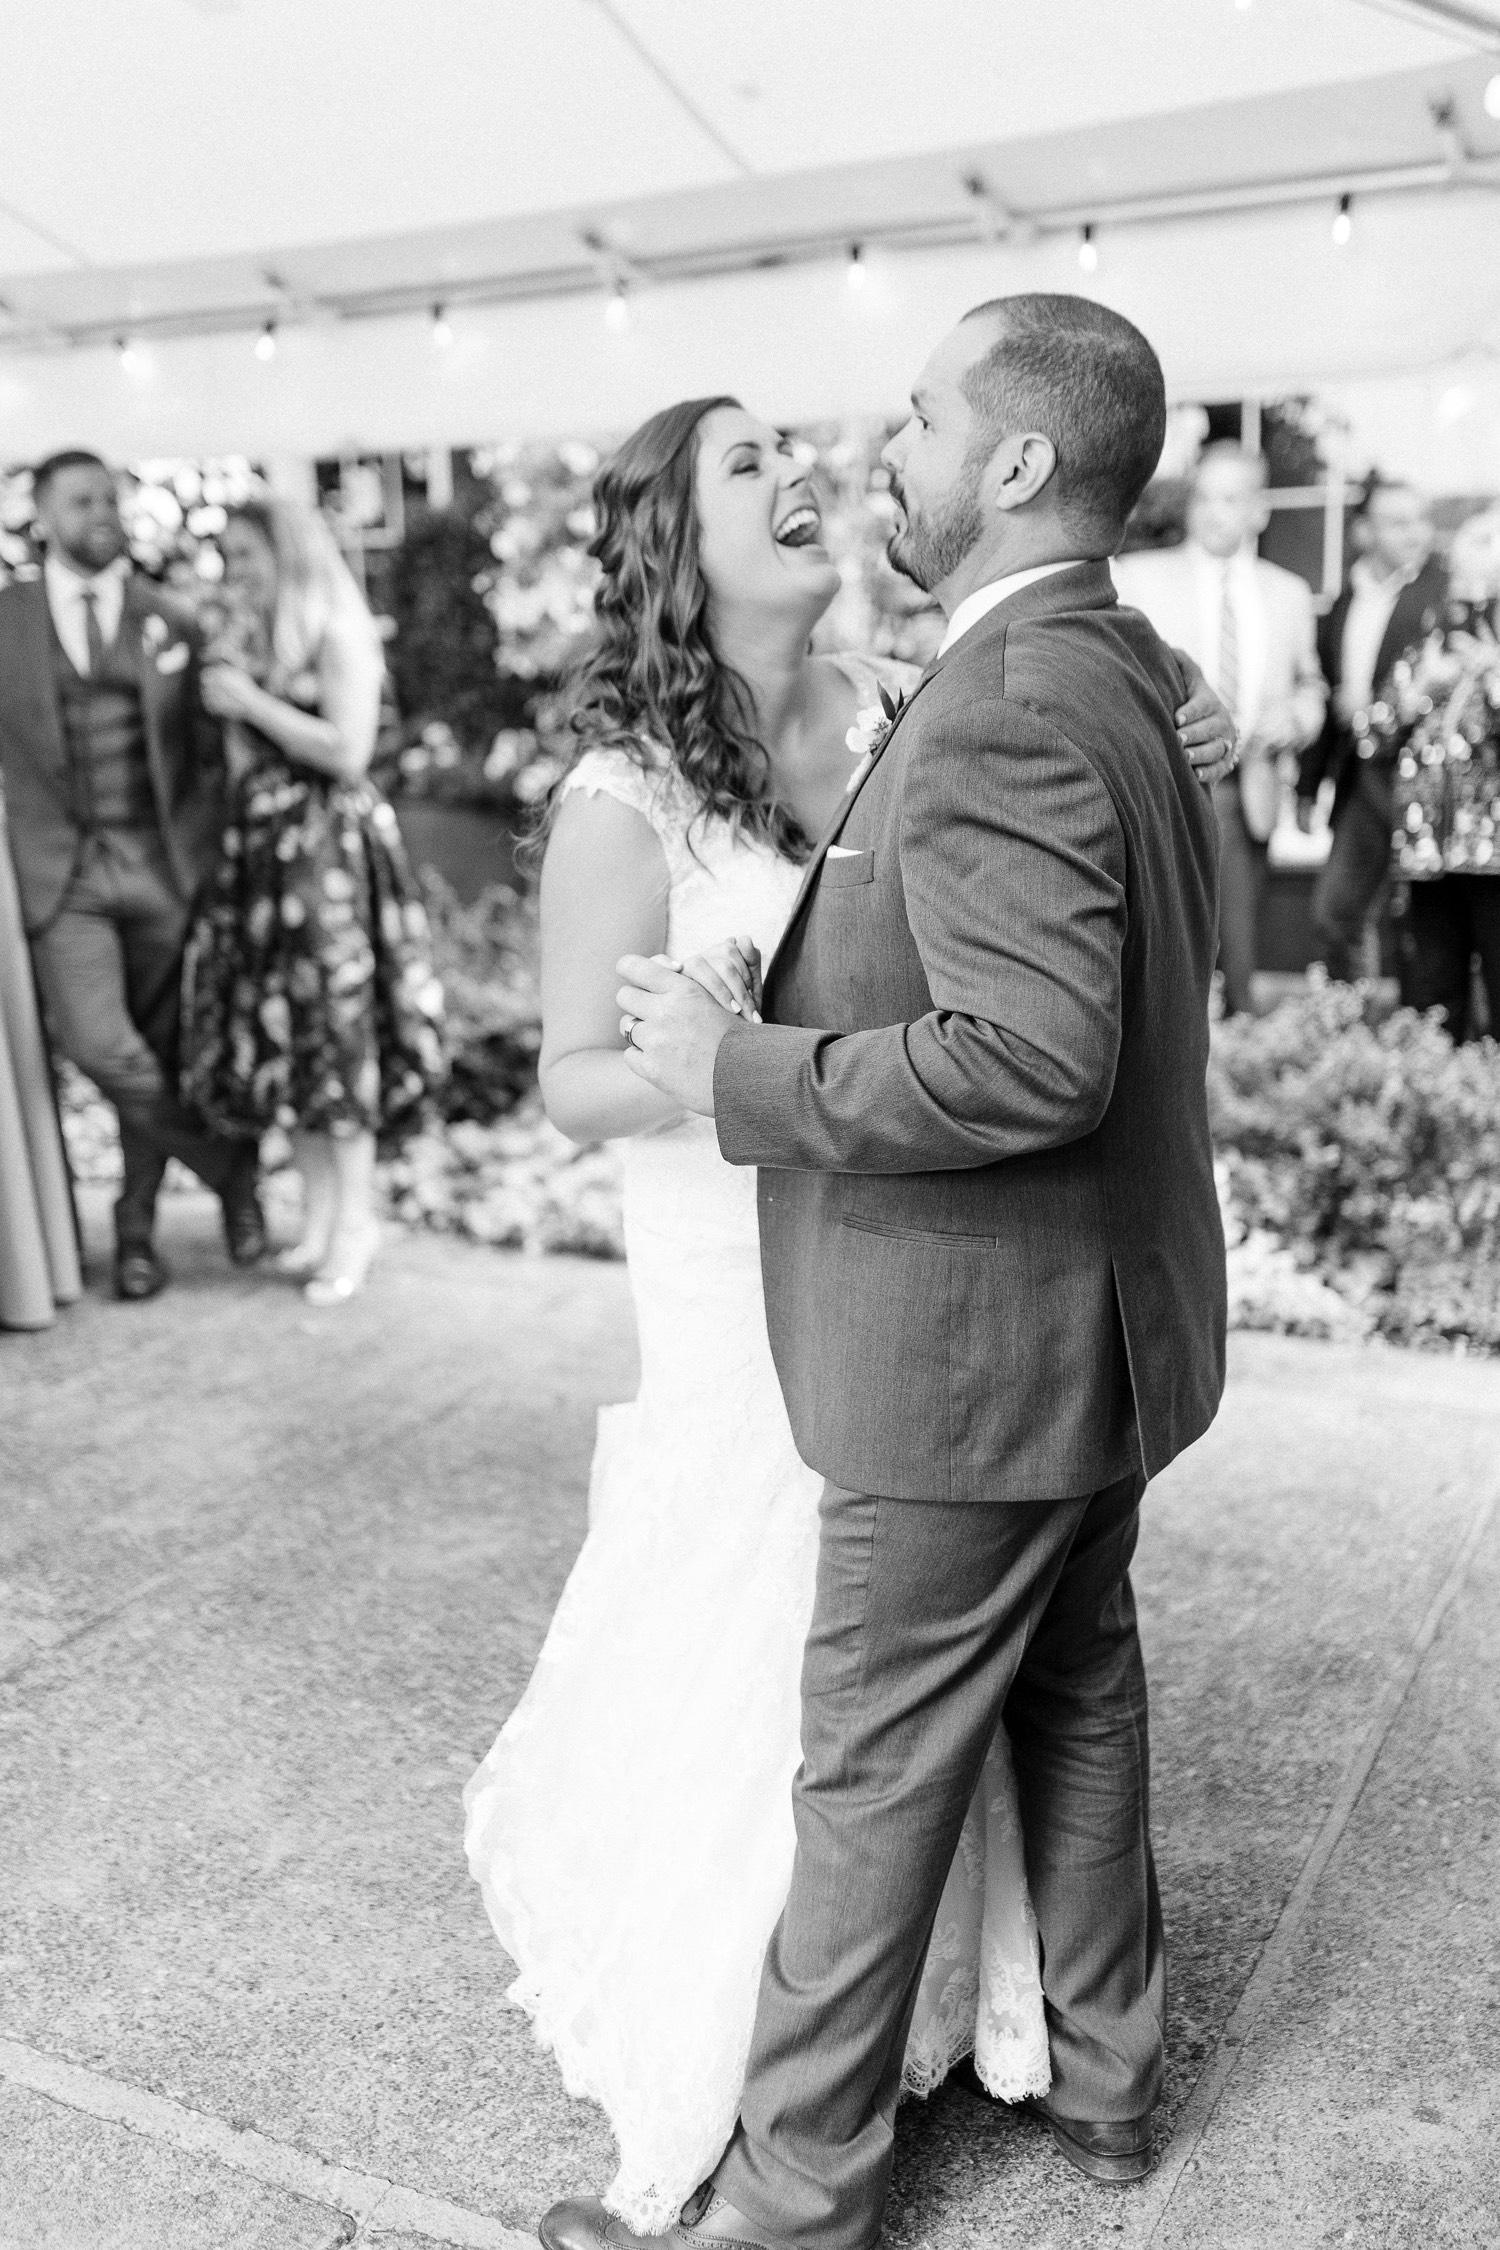 0000000000097_emmarosecompany_katiematt-4416_Photographer_PNW_House_Robinswood_Emma_Light_Company_Airy_Rose_and_Wedding_Seattle.jpg